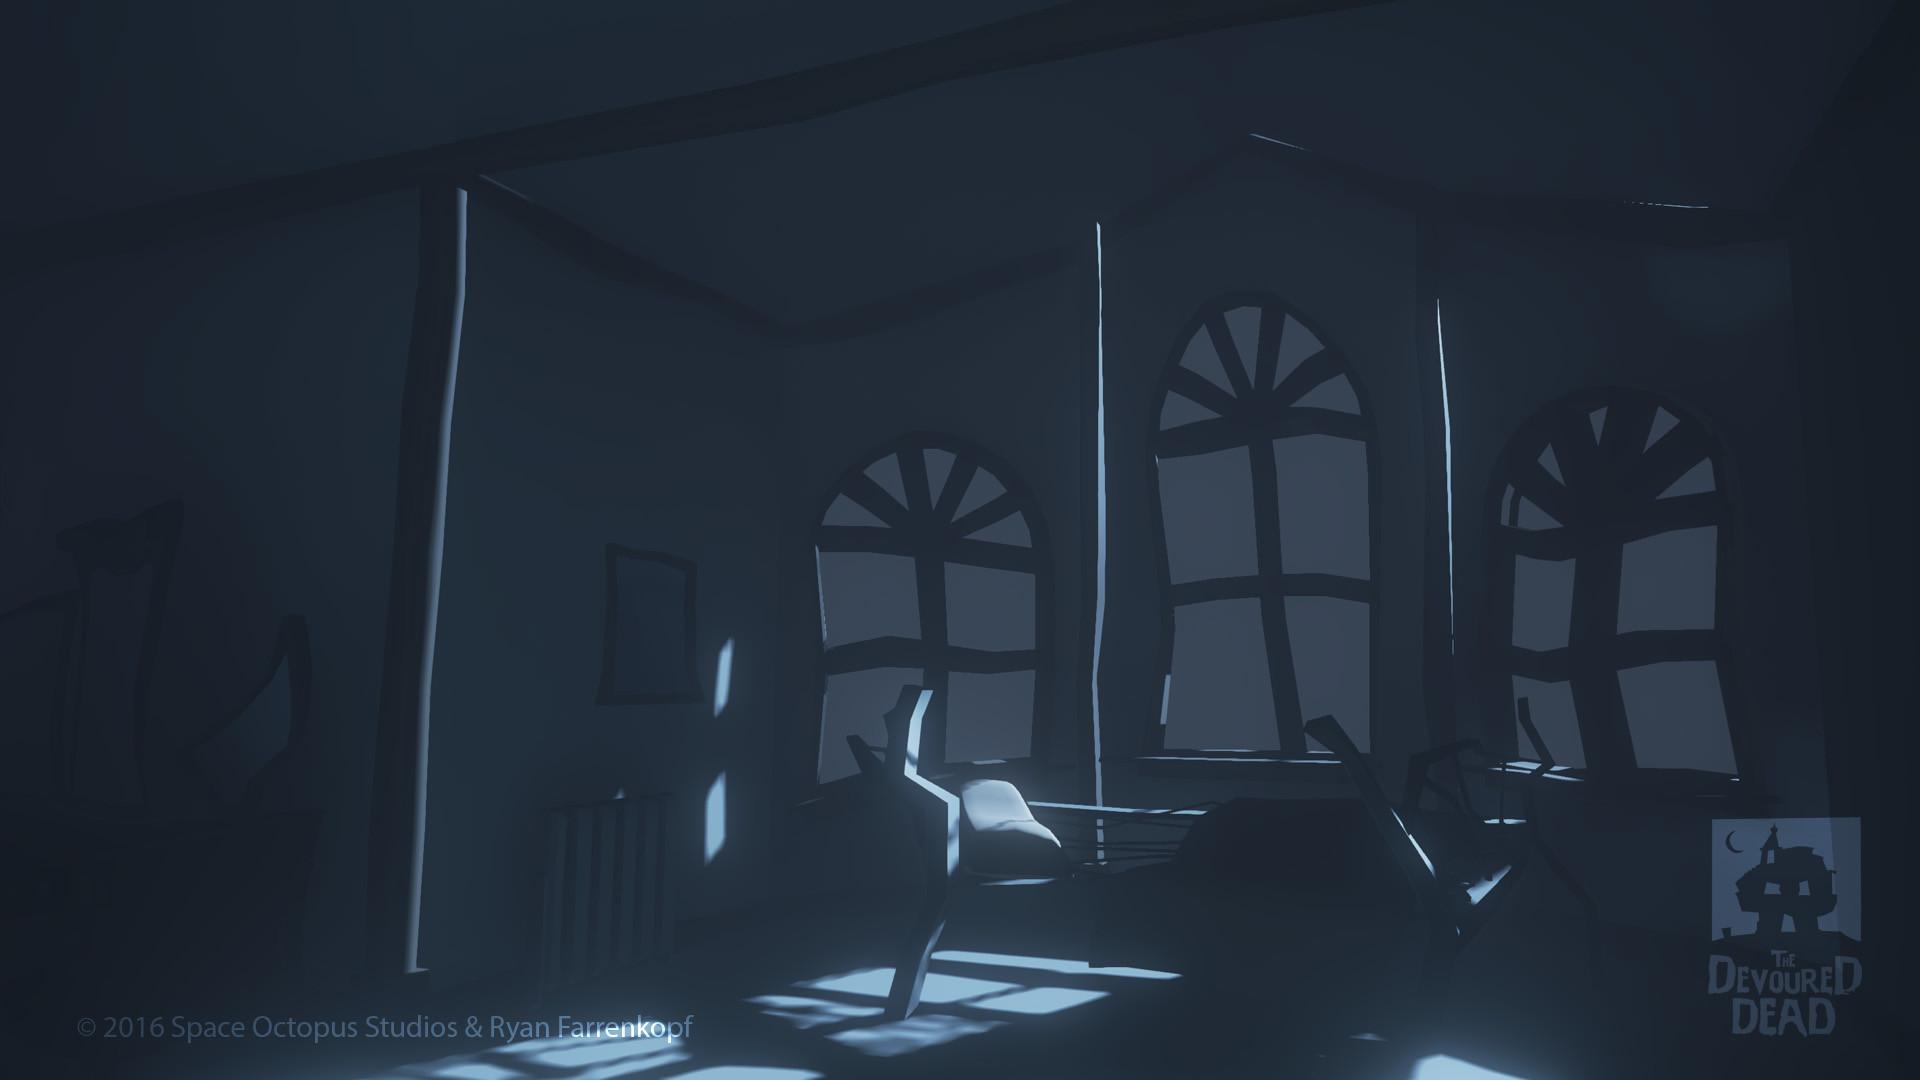 Ryan farrenkopf tdd bedrooma 01